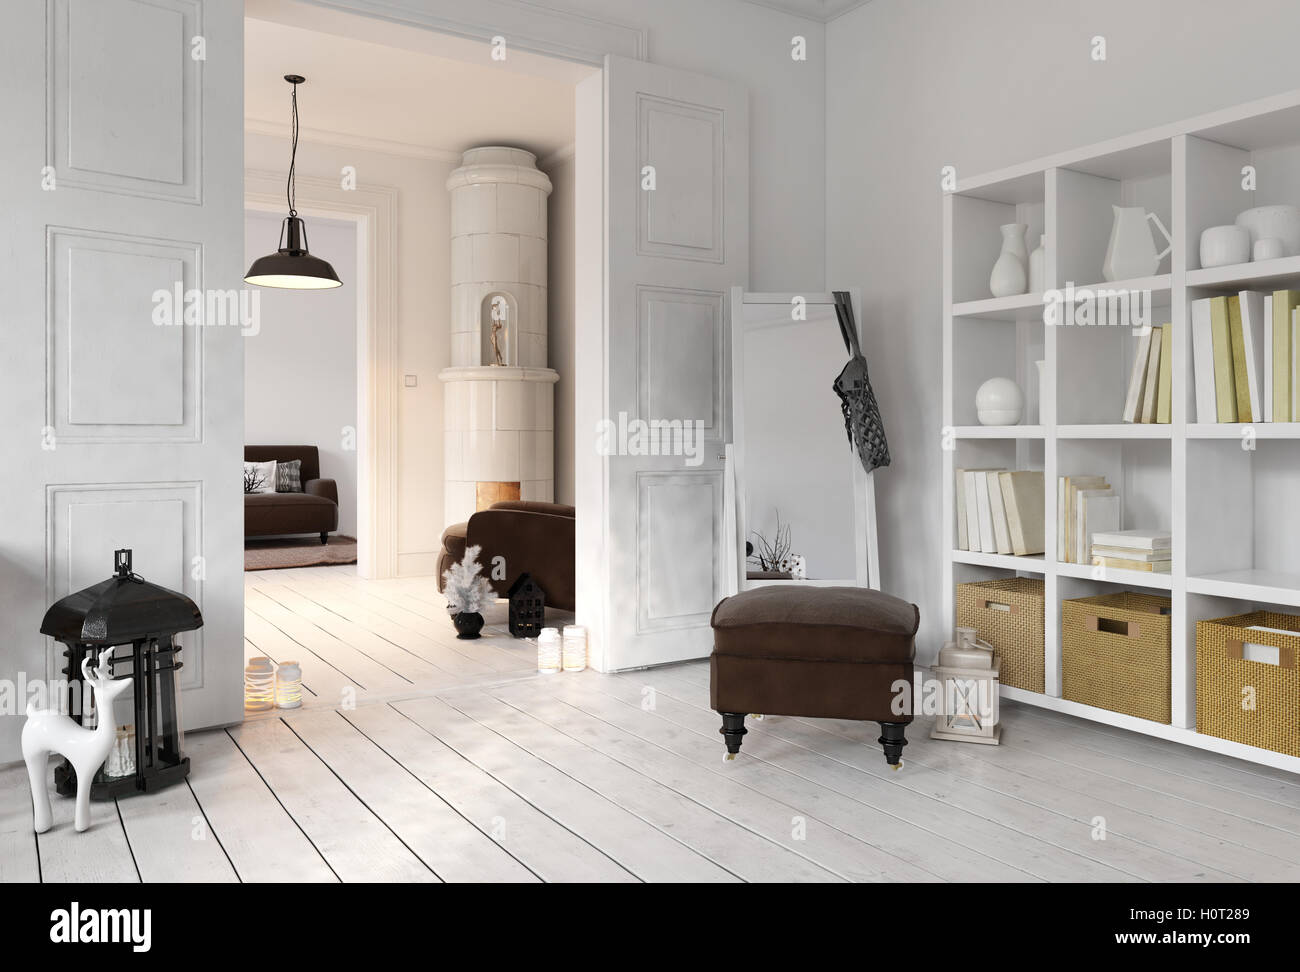 3d render of apartment living room with bookshelf floor mirror in stock photo 121001225 alamy. Black Bedroom Furniture Sets. Home Design Ideas